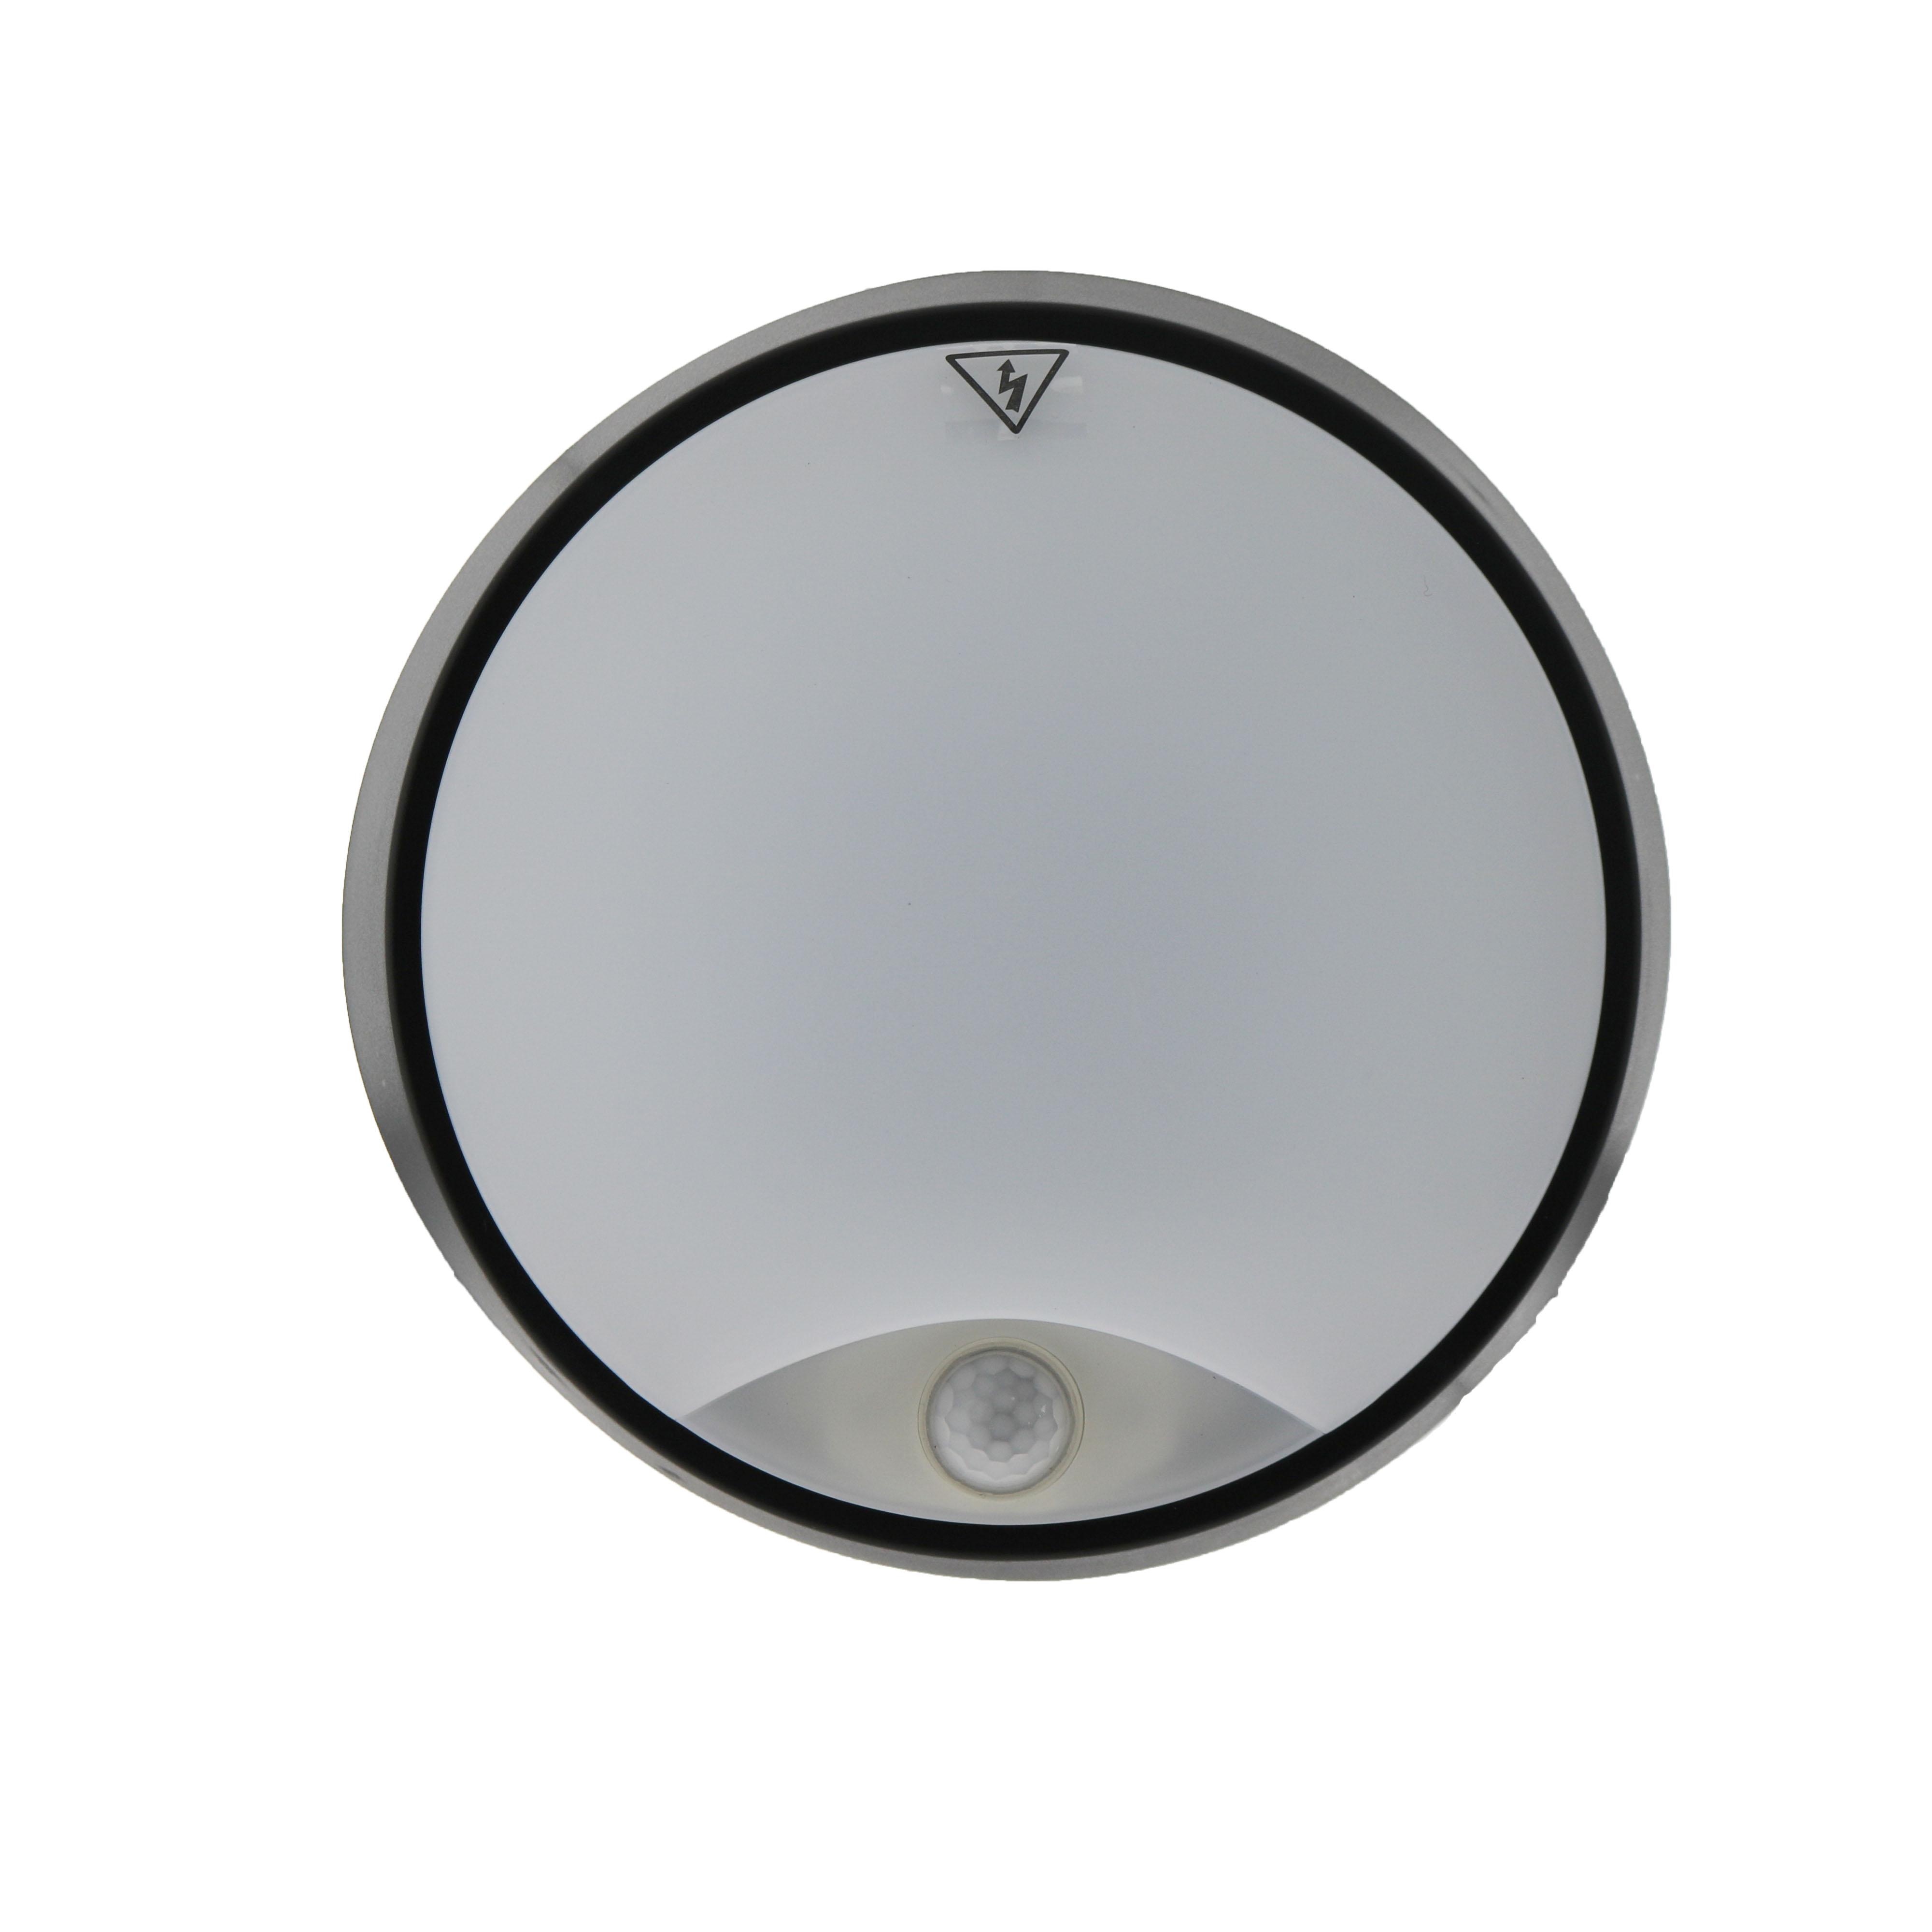 Plaf n led luxtar black con sensor pir 14w ip54 iluminashop for Plafon pared led con sensor pir